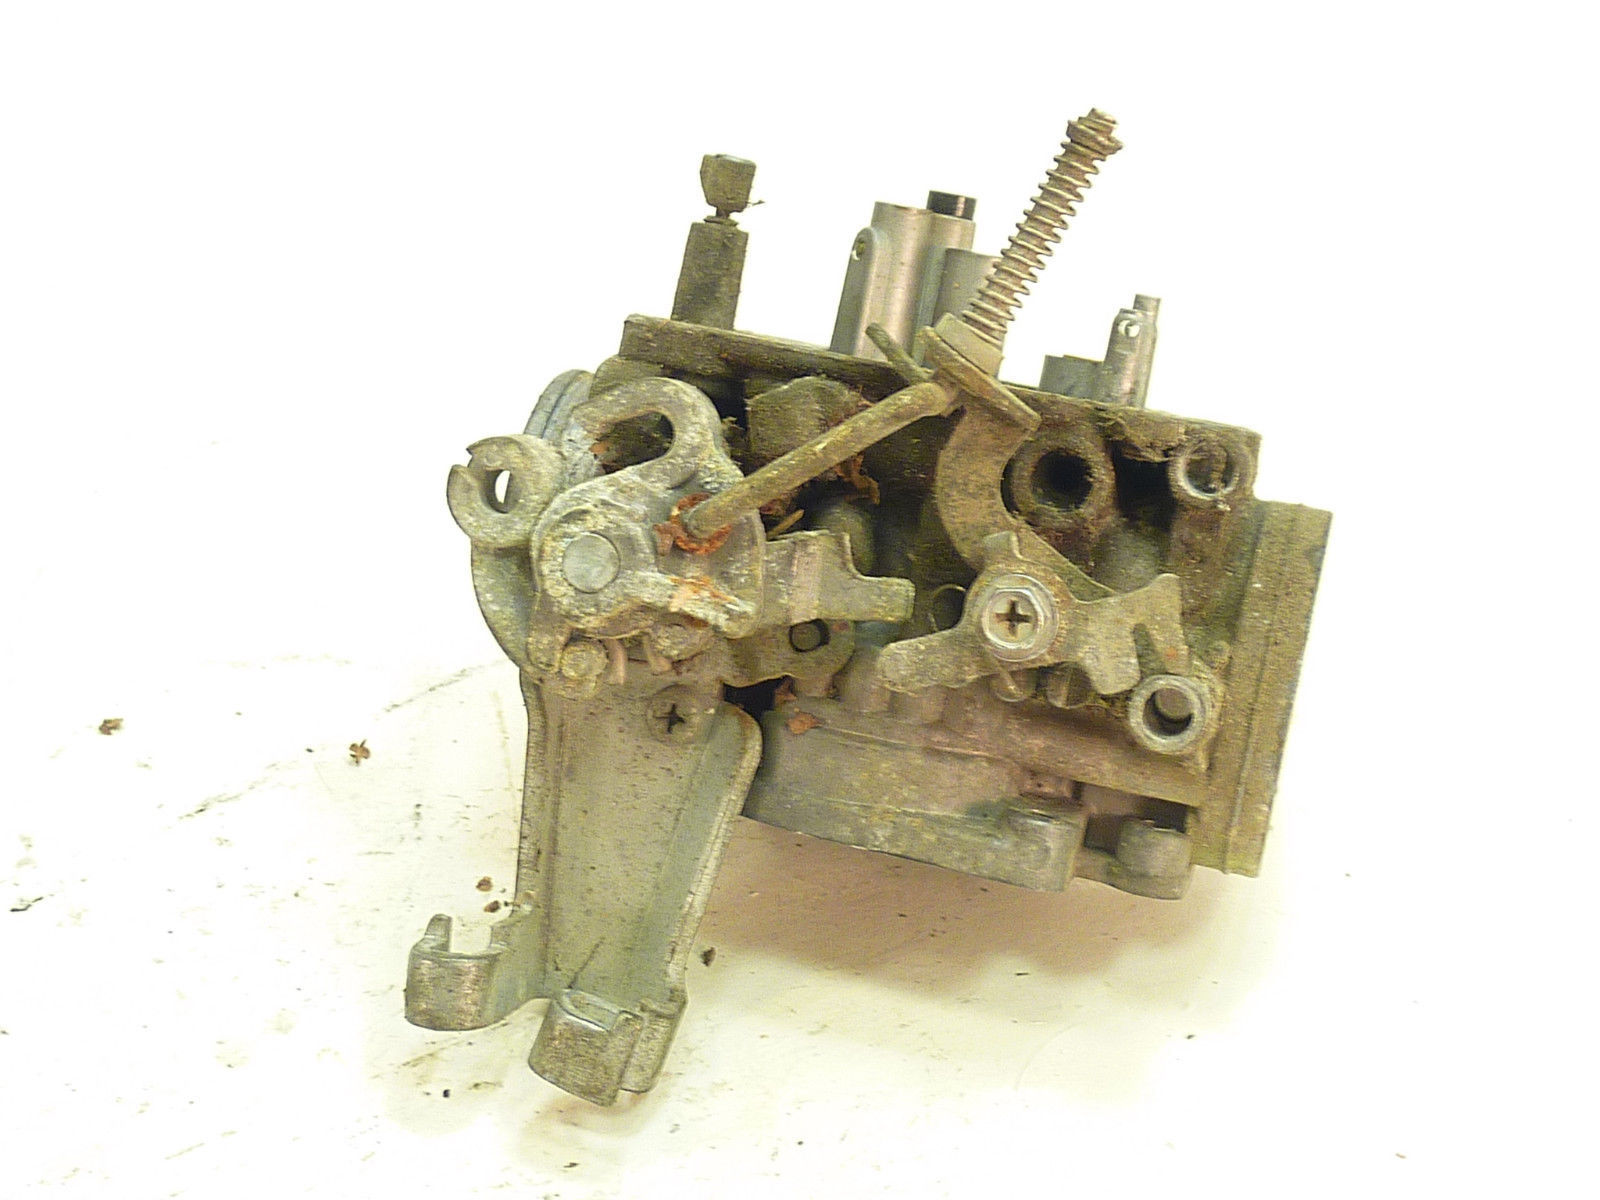 1983 Honda CB1000 Carburetor Body (Center Left Carb) 83 Engine LH Side L #2